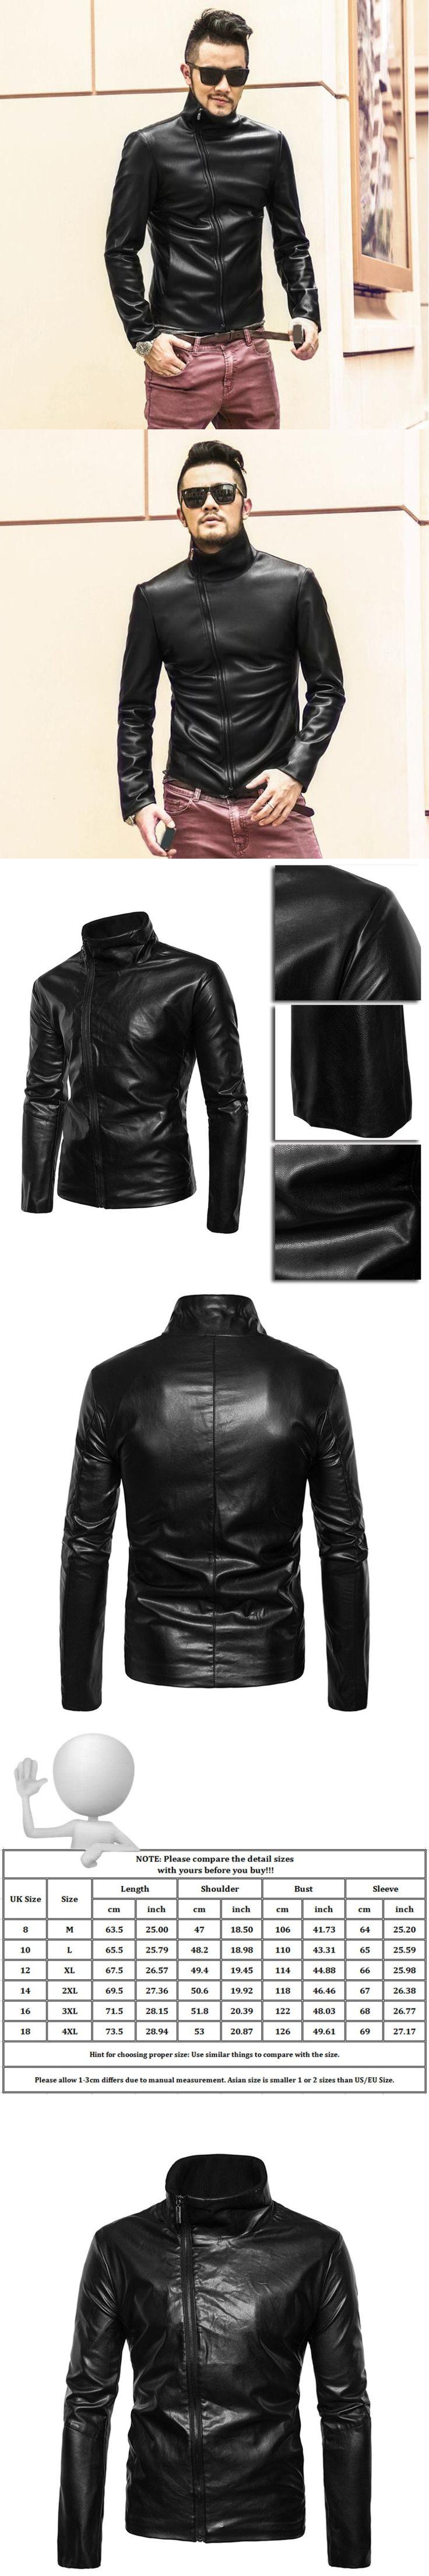 Imitation leather jacket men motorcycle jackets Black Leather Slim short stand collar British Jaqueta Couro Masculino Plus Size